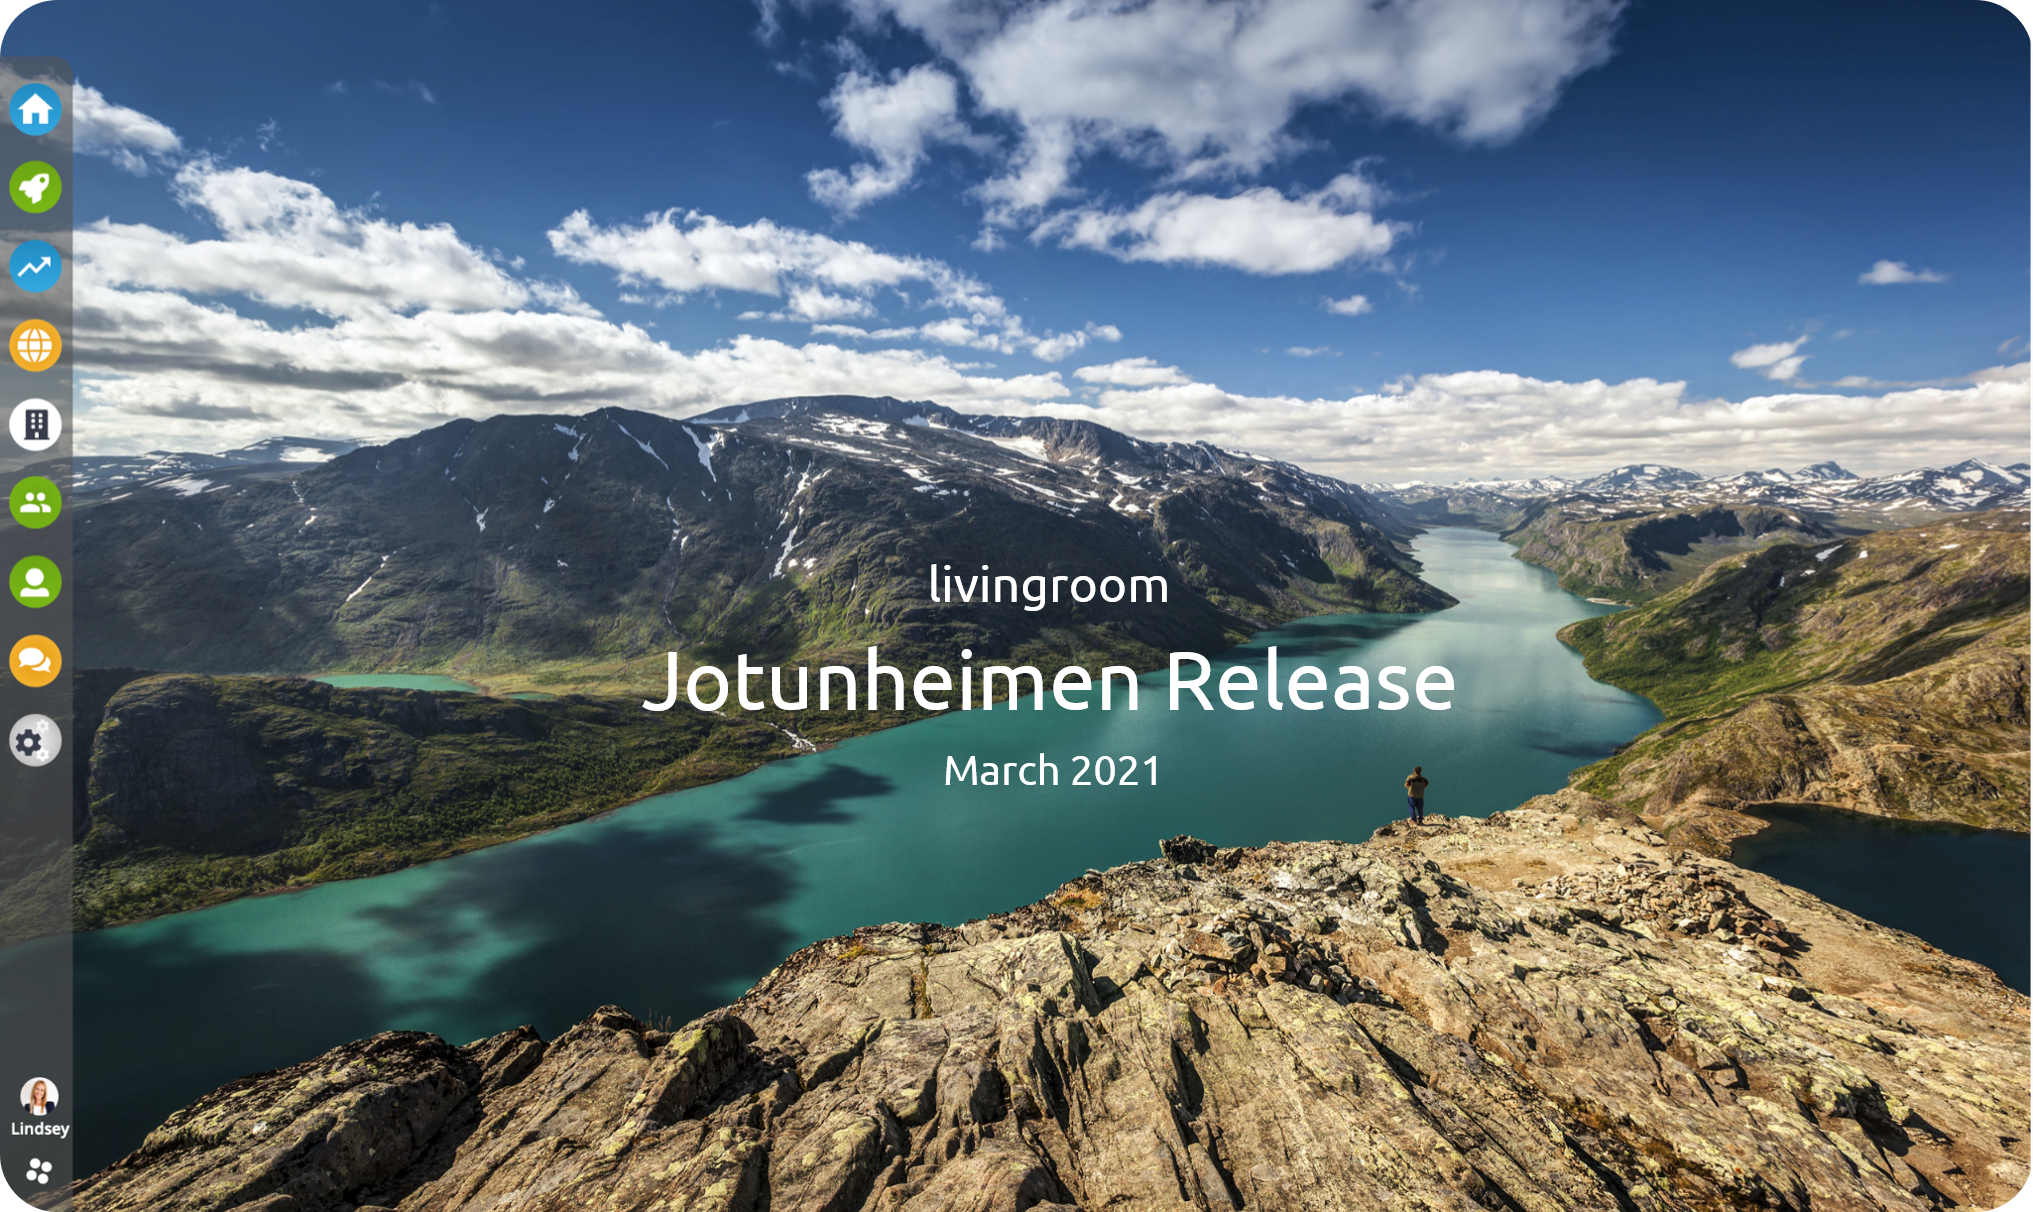 Jotunheimen Release